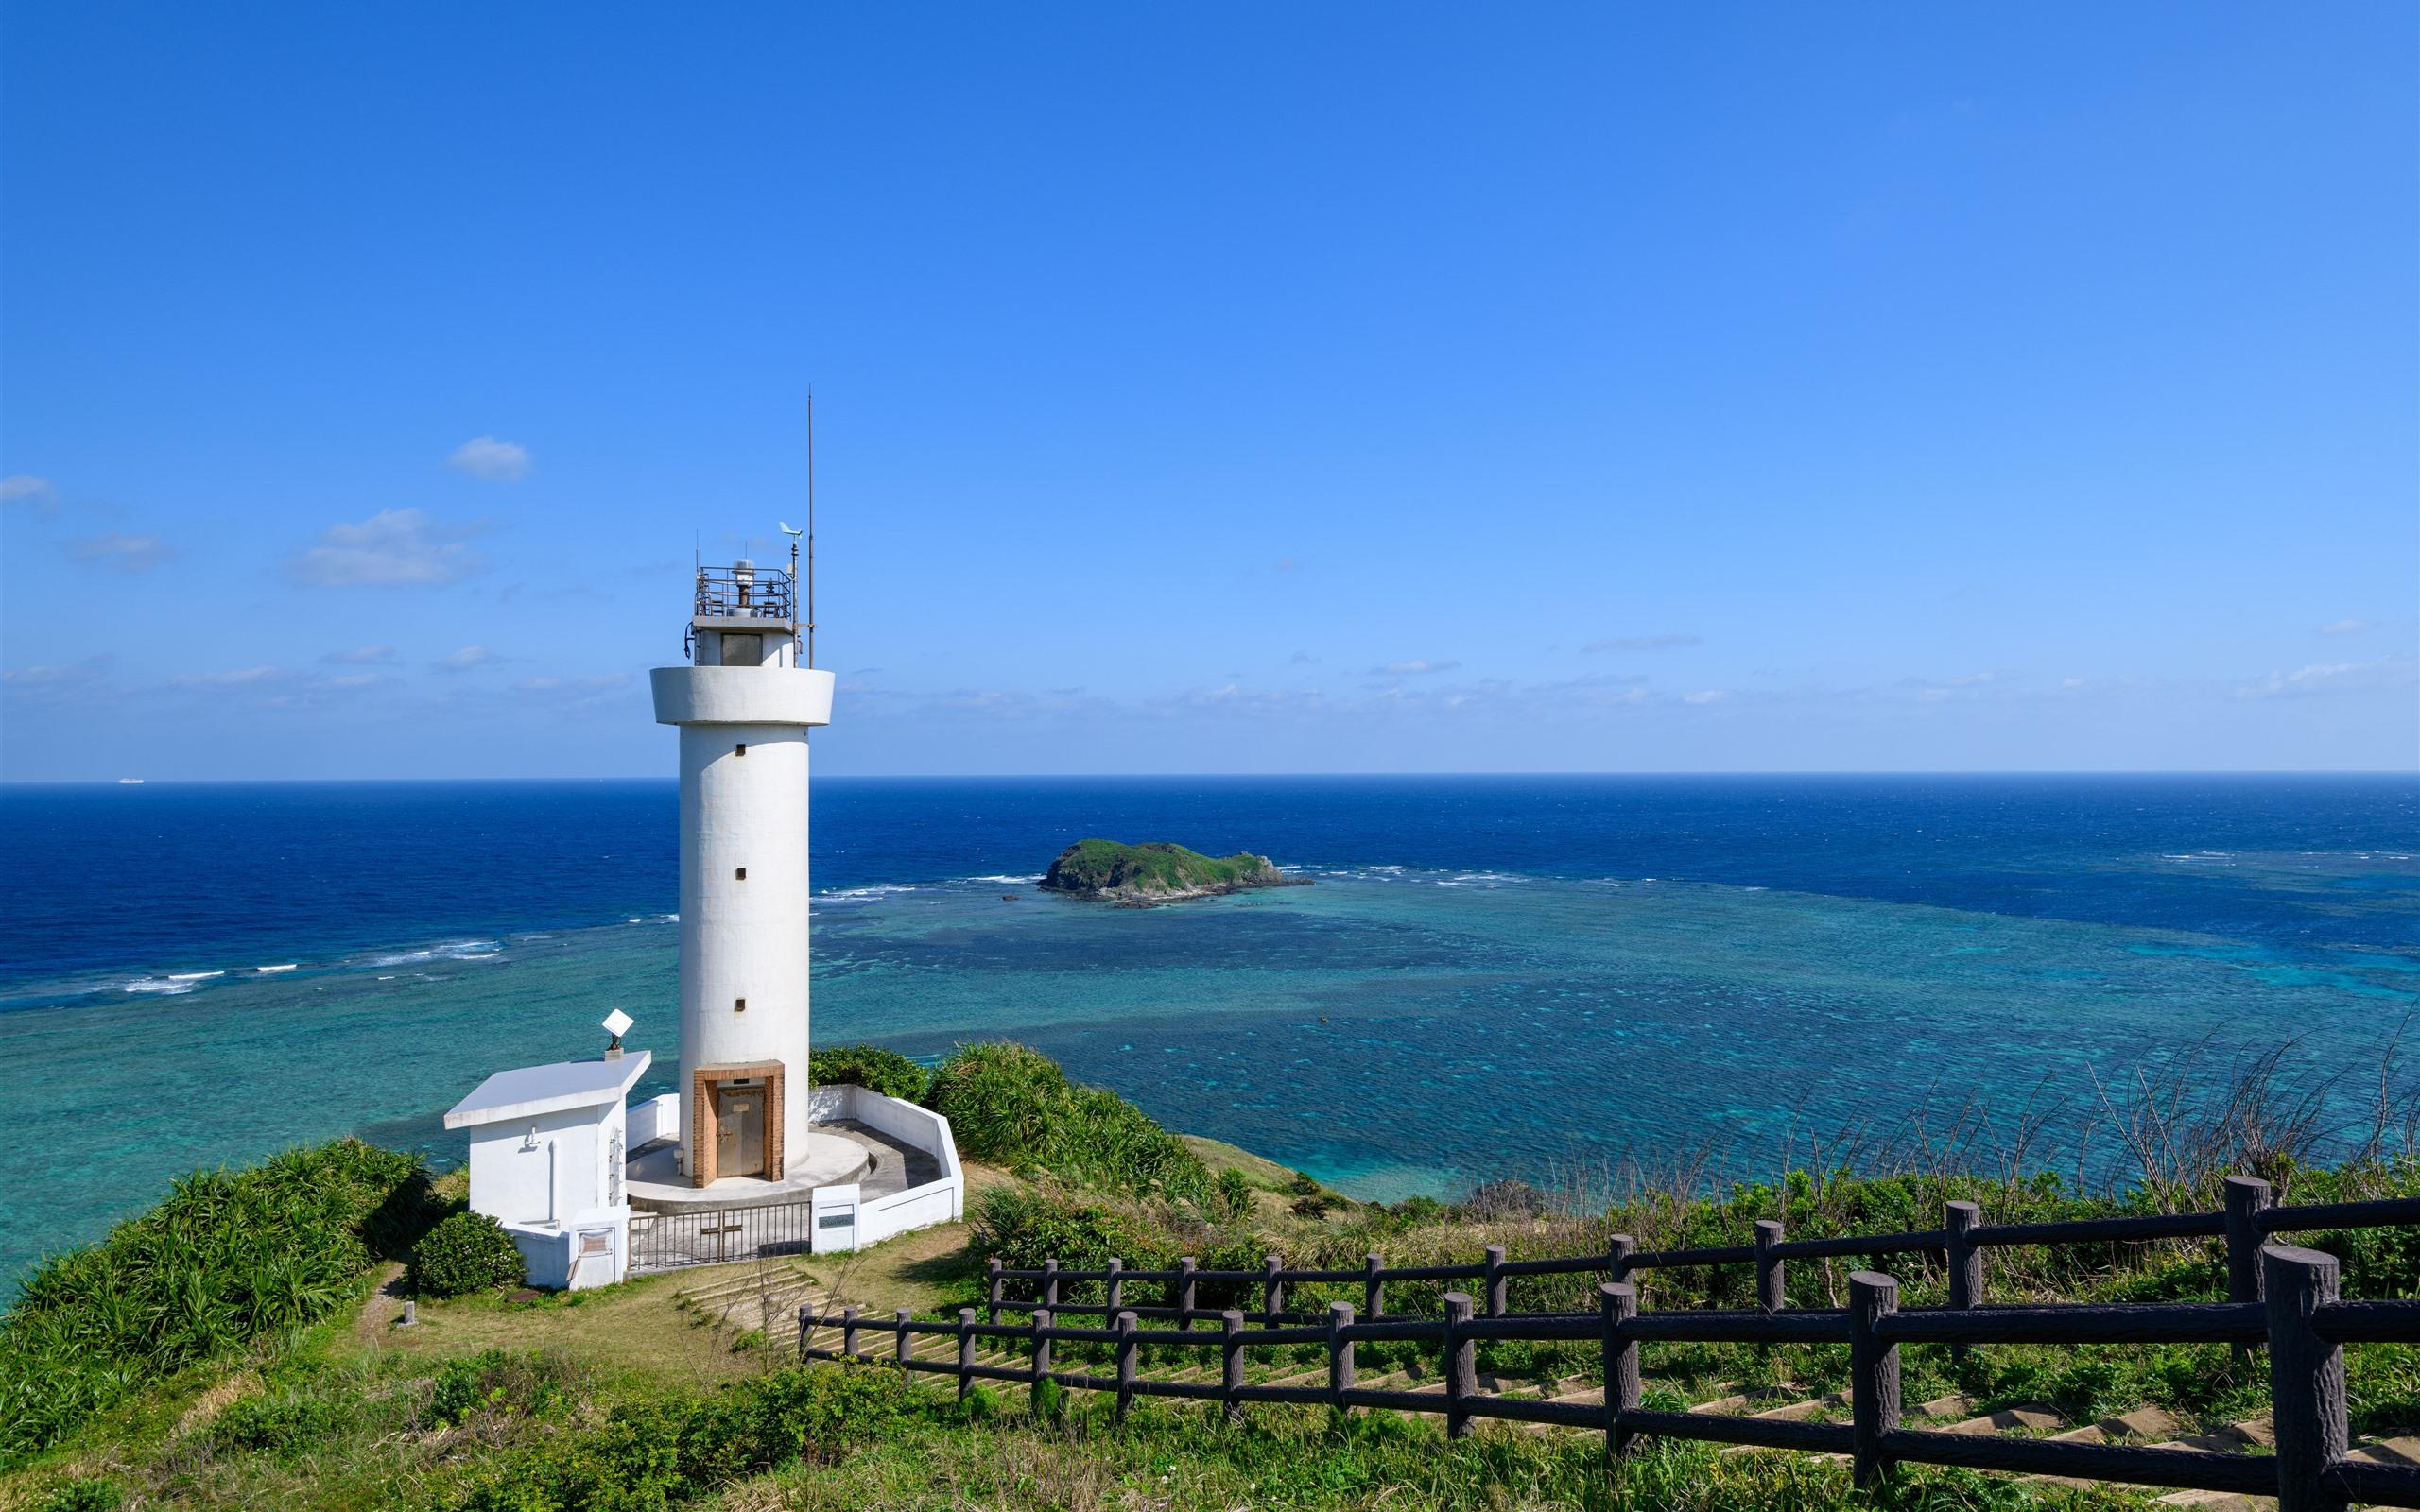 Wallpaper Japan Lighthouse Sea Coast 7680x4320 Uhd 8k